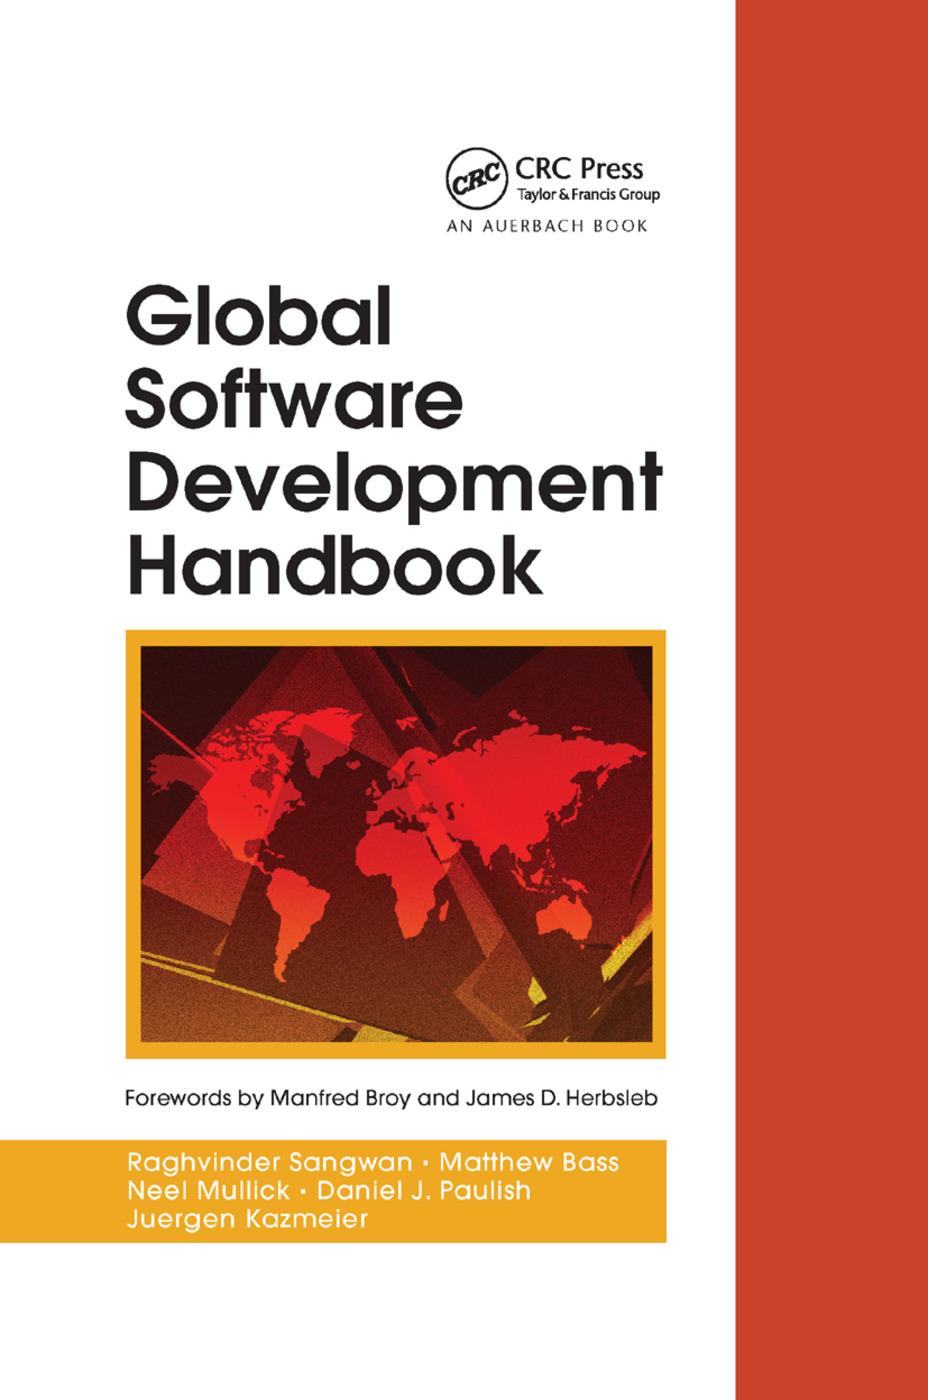 Global Software Development Handbook: 1st Edition (Paperback) book cover